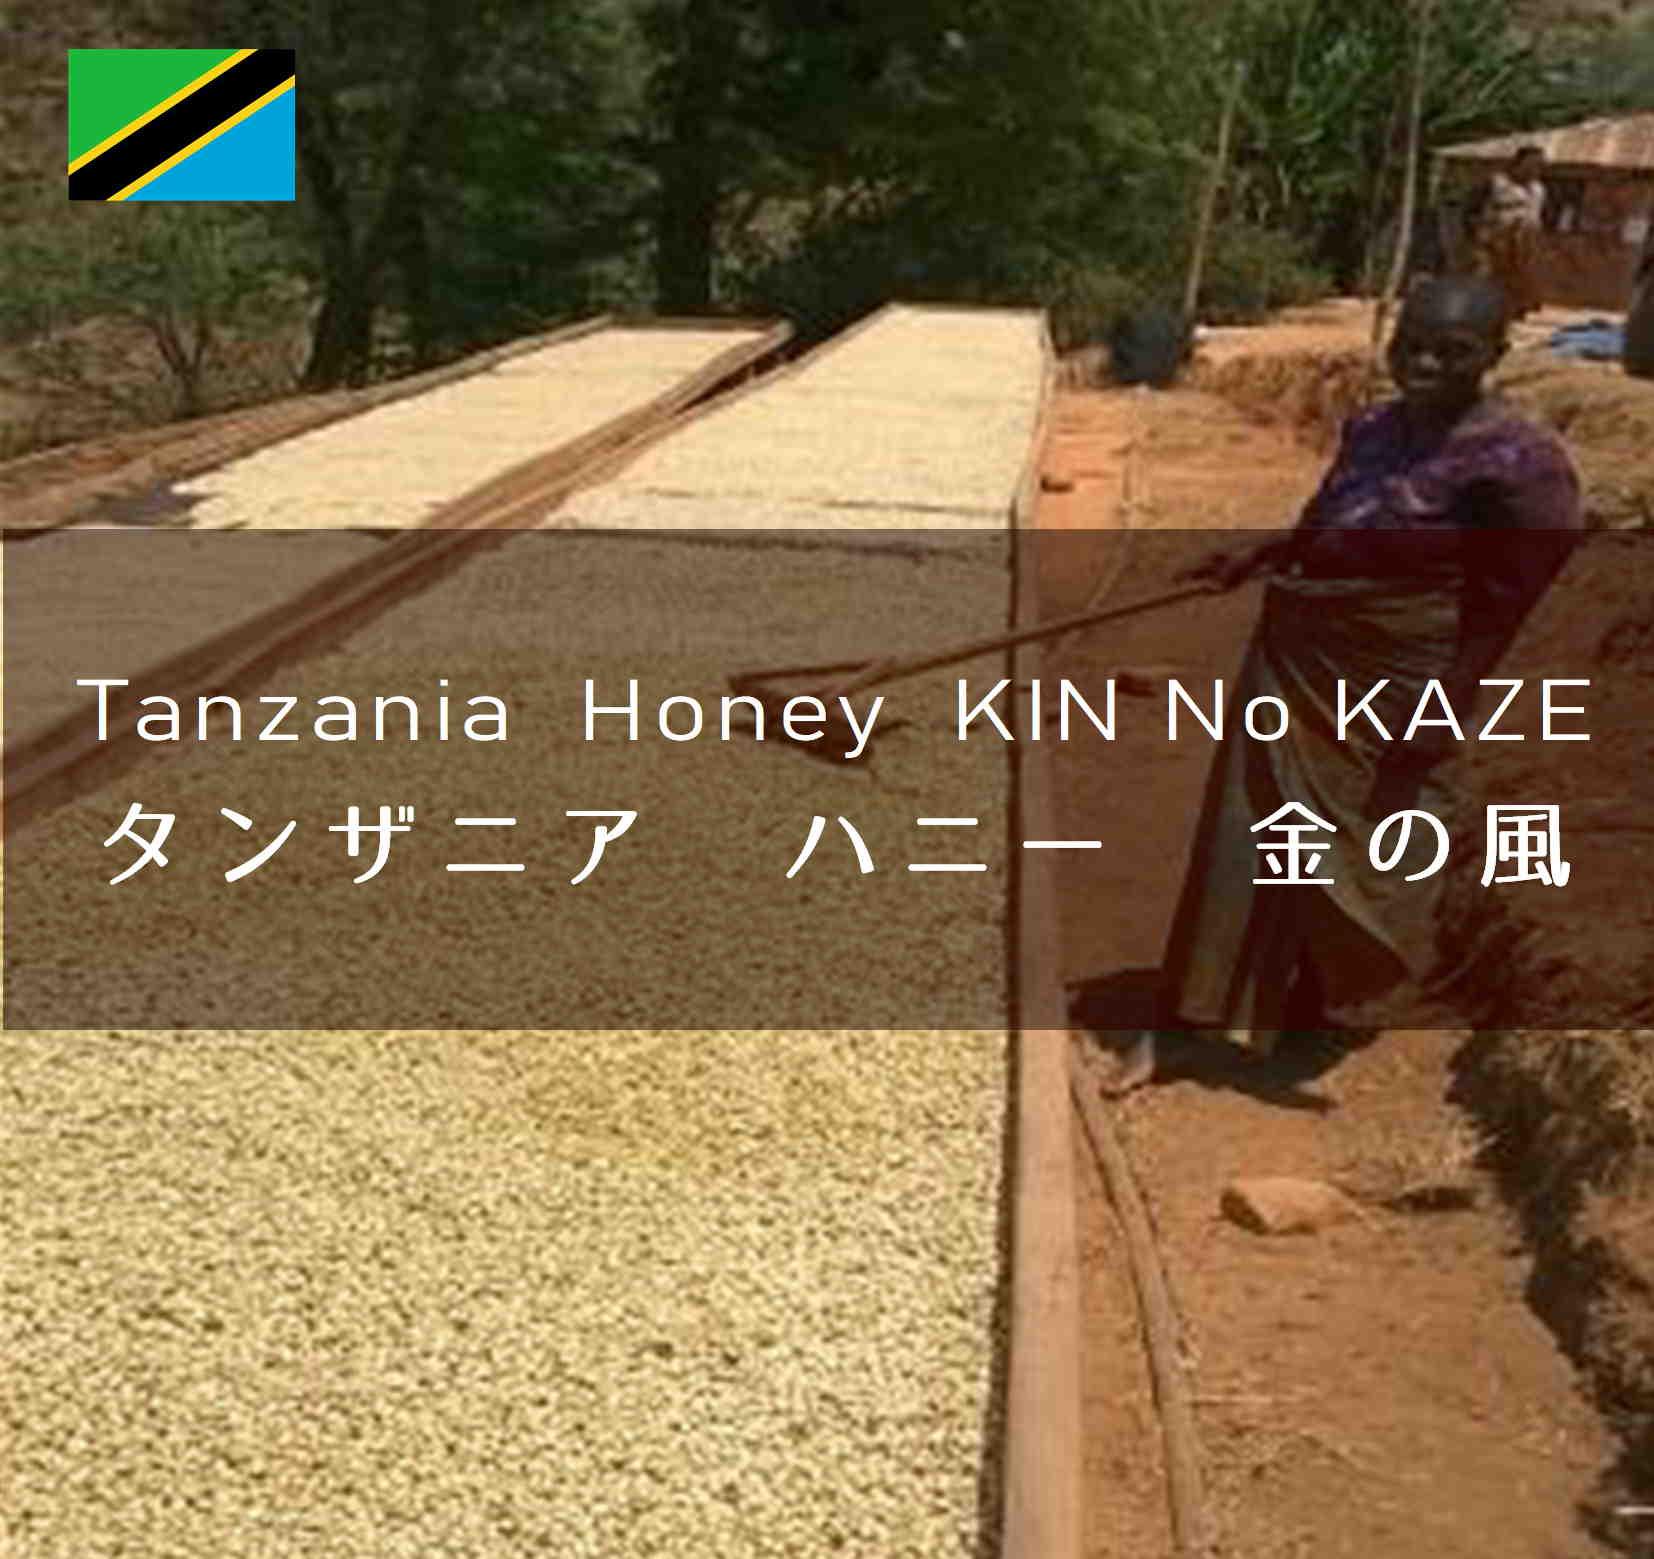 TanzaniaKINnoKAZEHoney